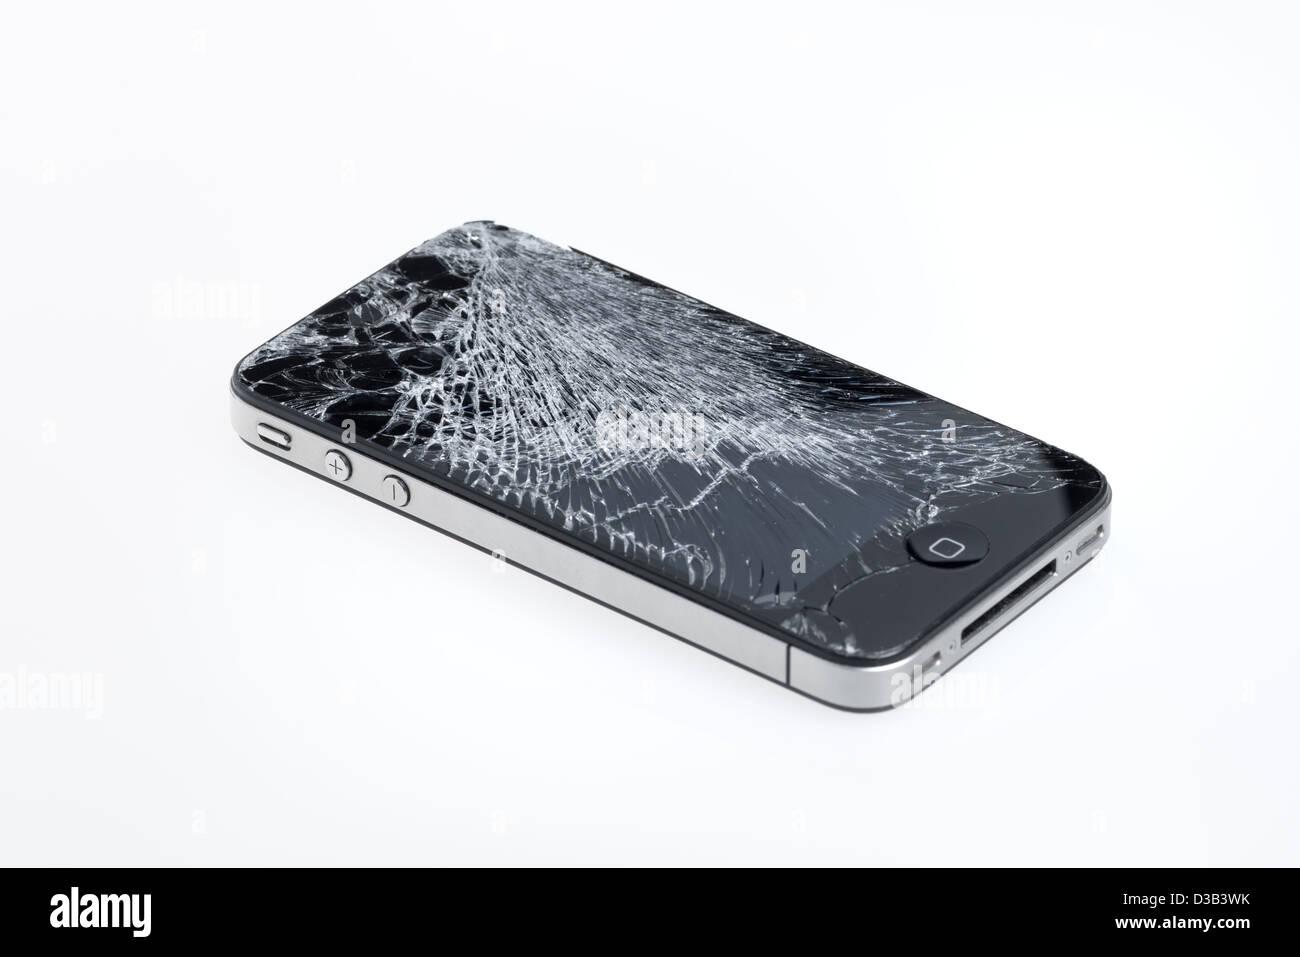 The old Apple iPhone 4 with broken screen, studio shot. - Stock Image